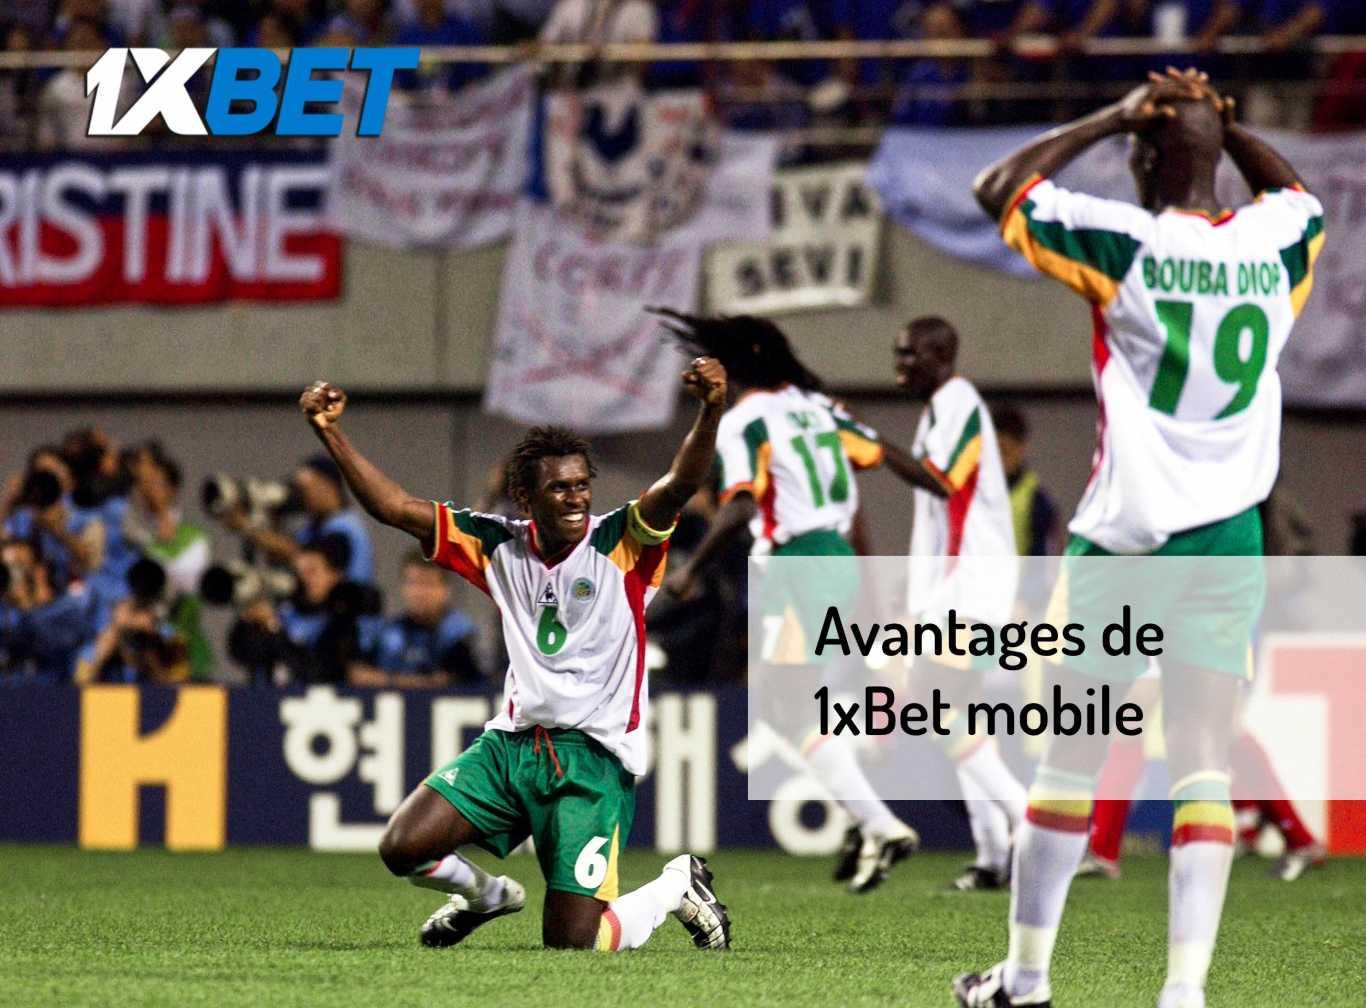 telecharger 1xBet mobile Senegal